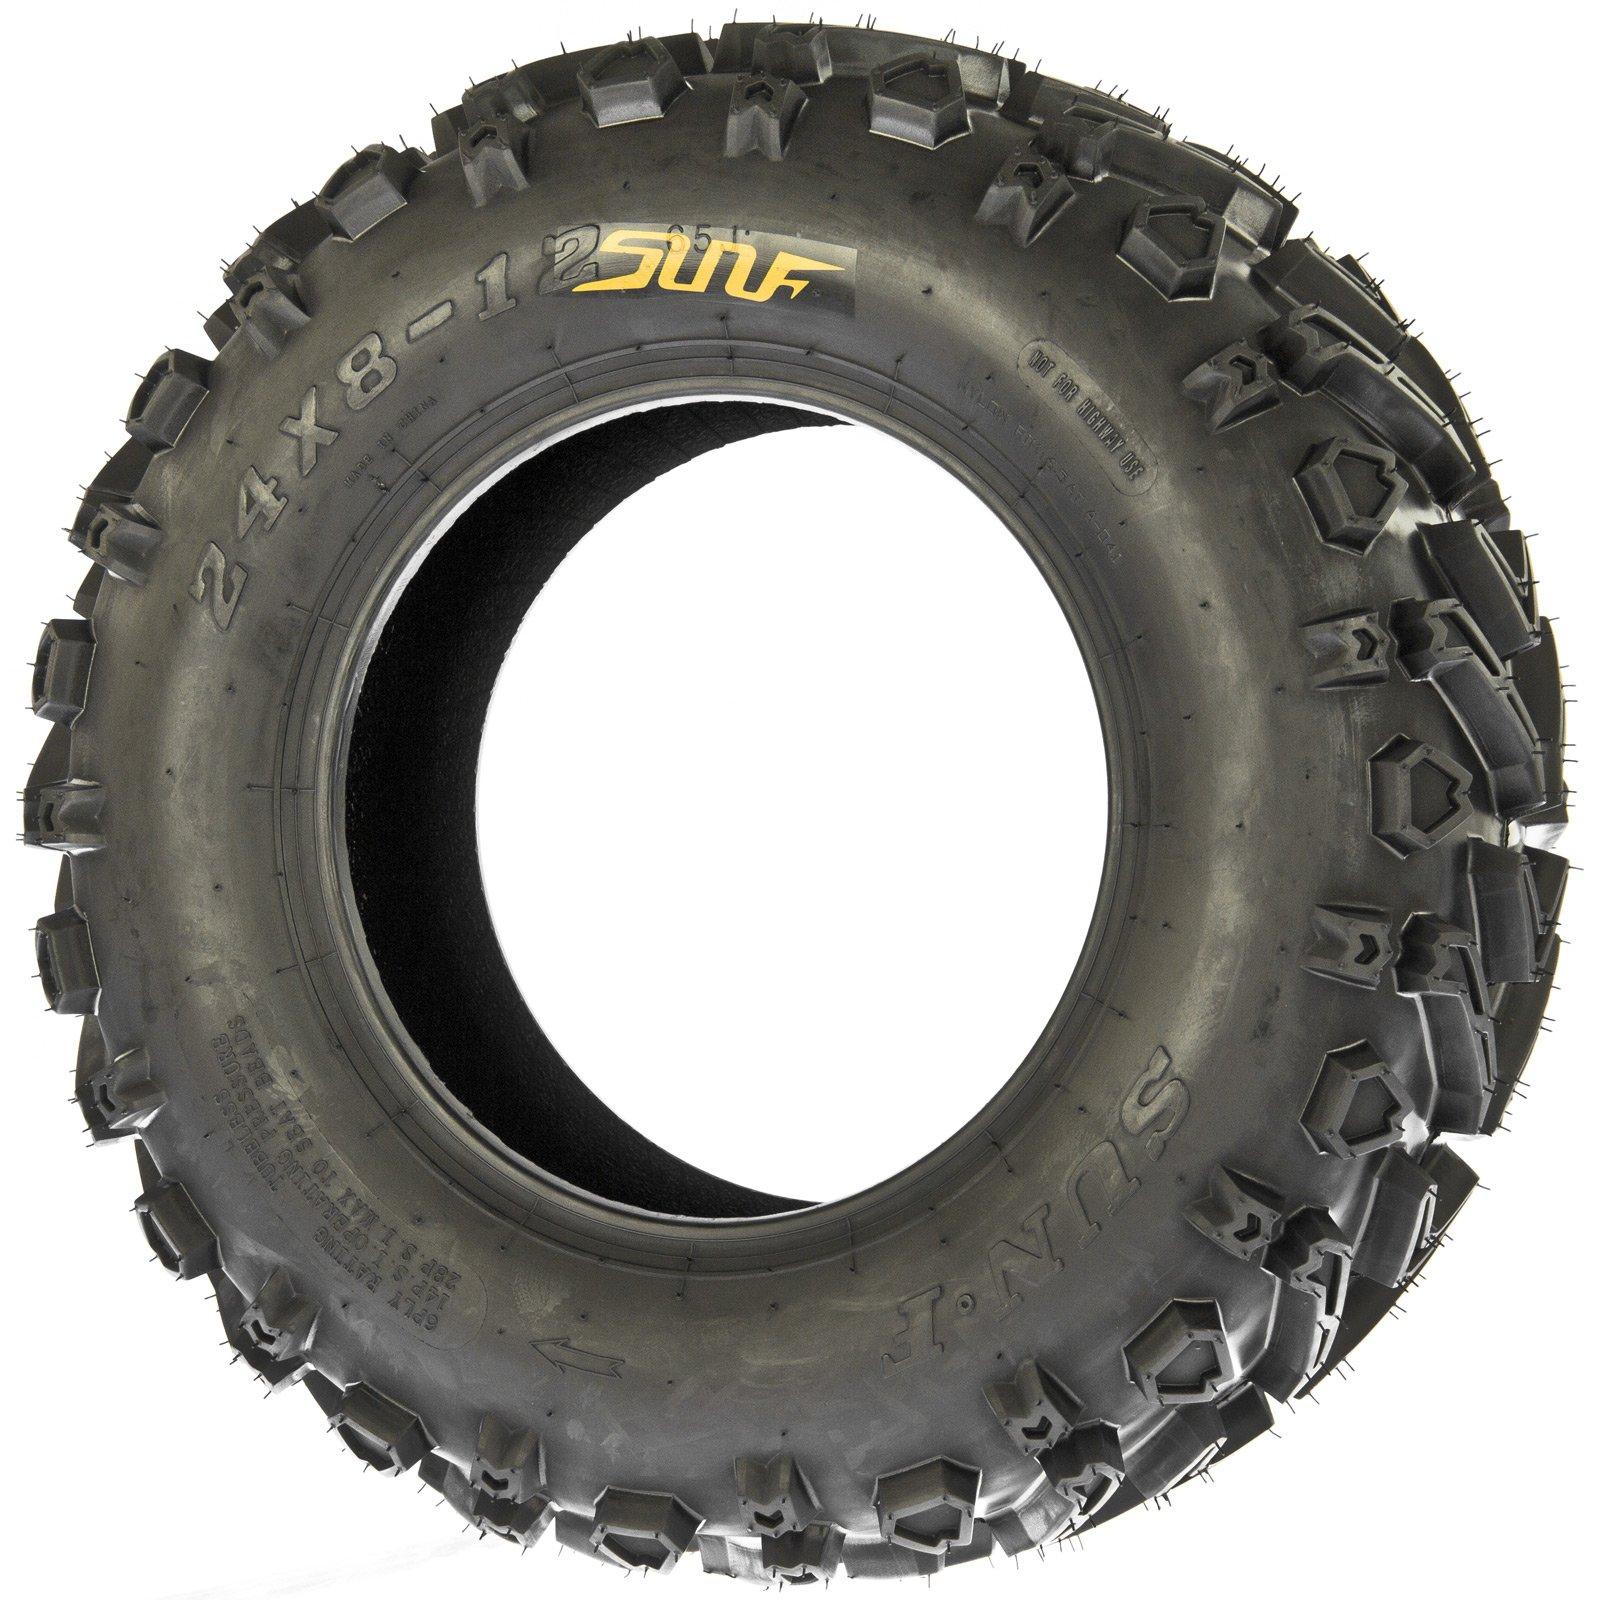 SunF 24x8-12 24x8x12 All Terrain Mud ATV UTV Tires 6 PR A041 (Set pair of 2) by SunF (Image #3)